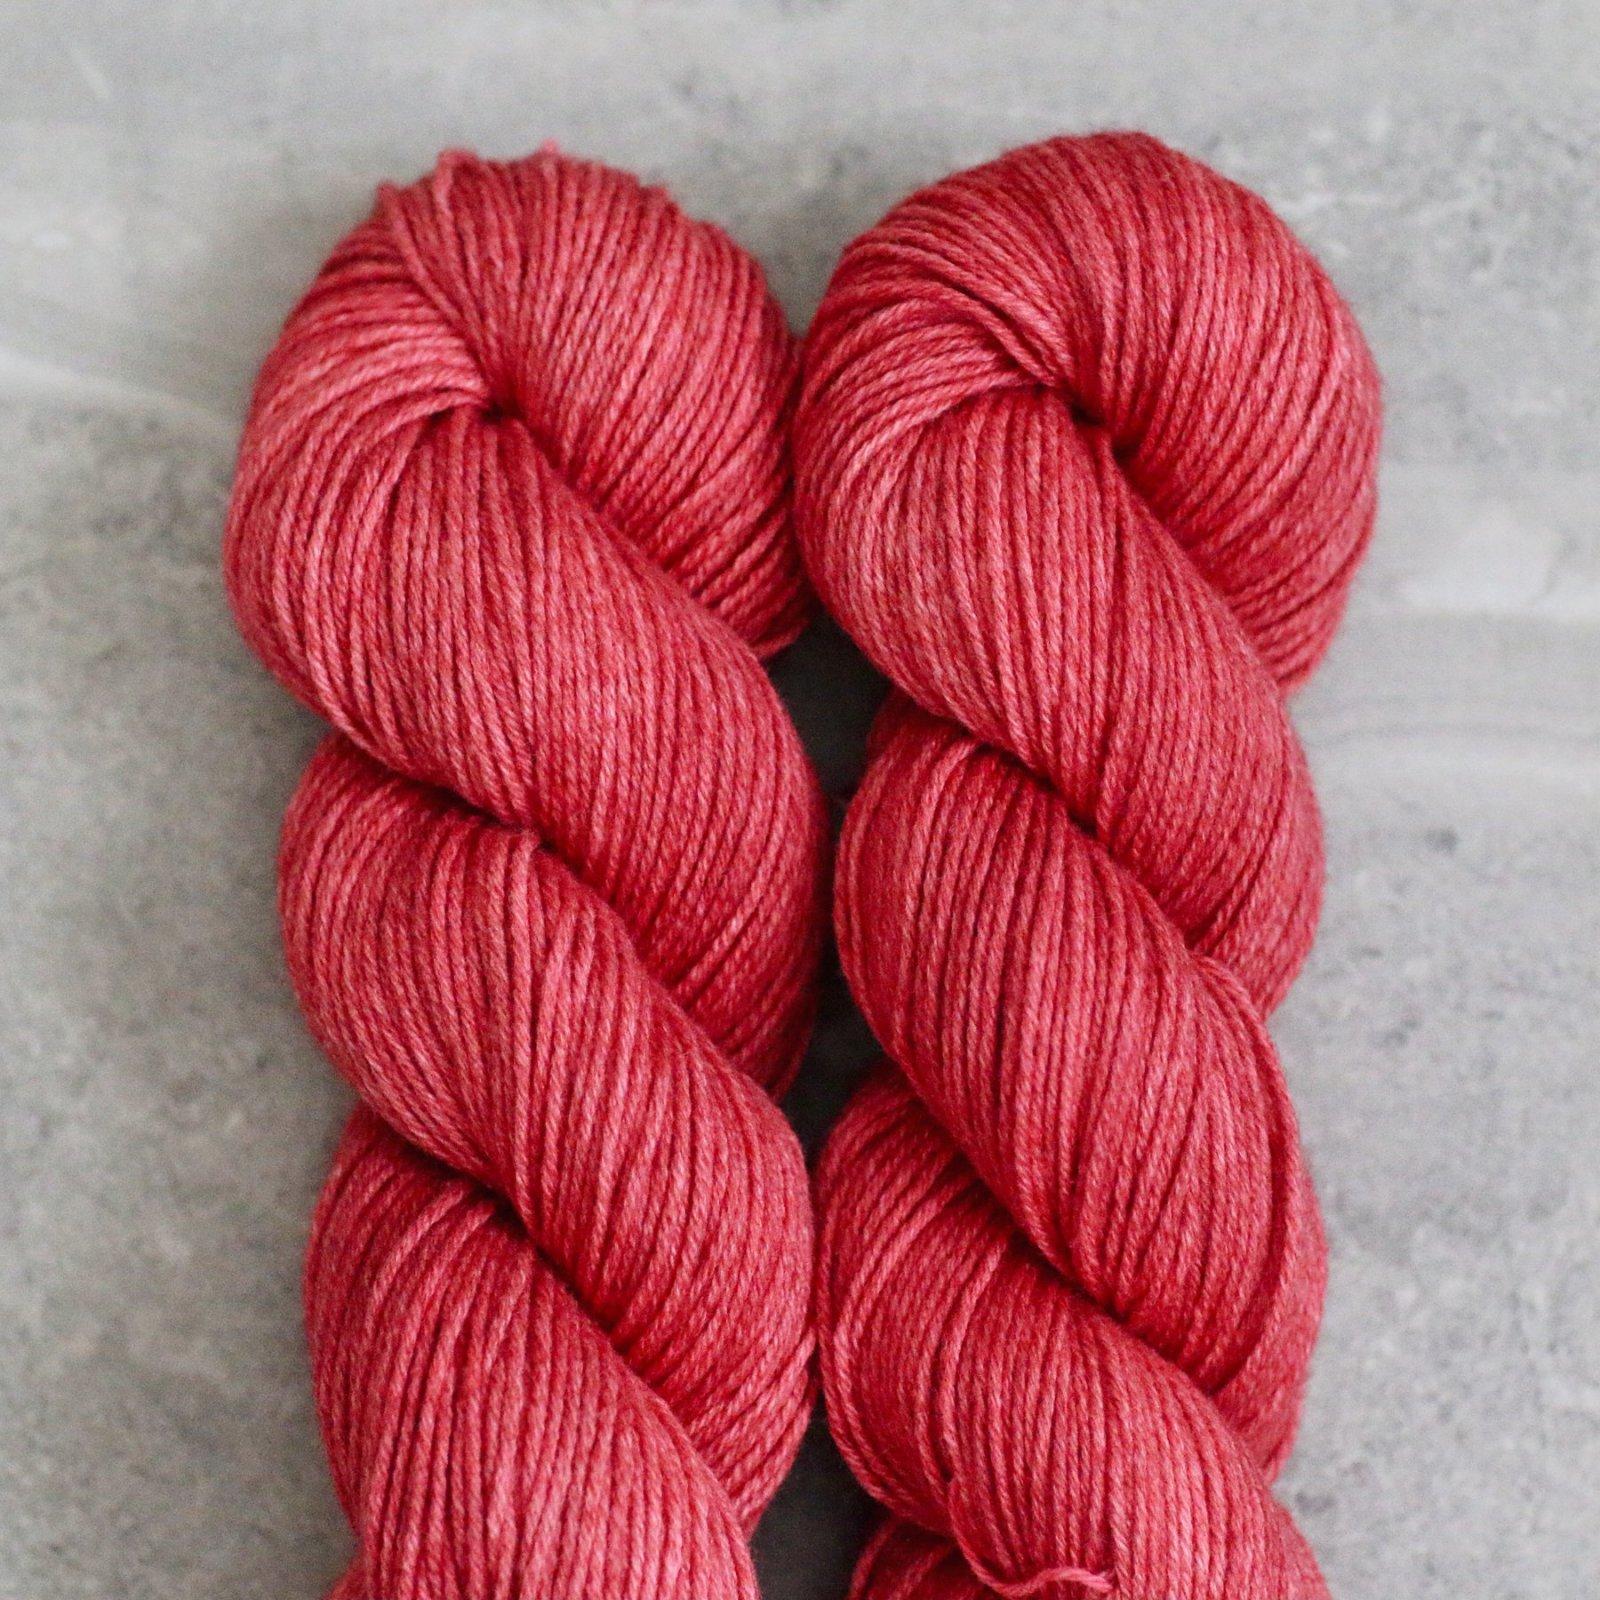 Madeline Tosh - Wool + Cotton